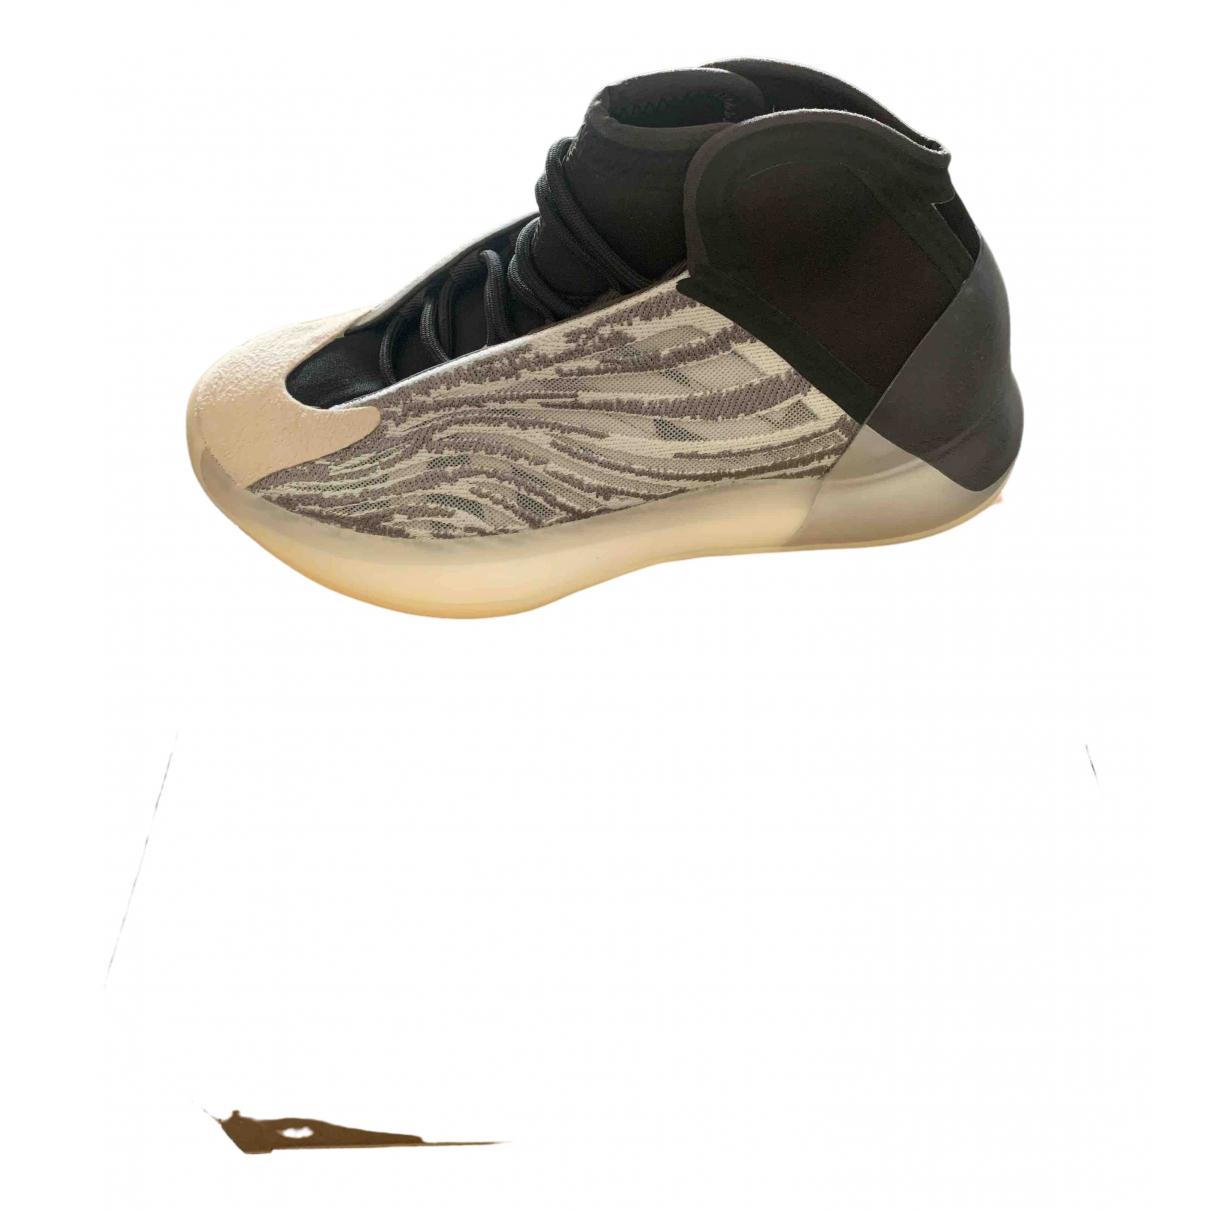 Yeezy X Adidas - Baskets QNTM BSKTBL pour femme en suede - beige